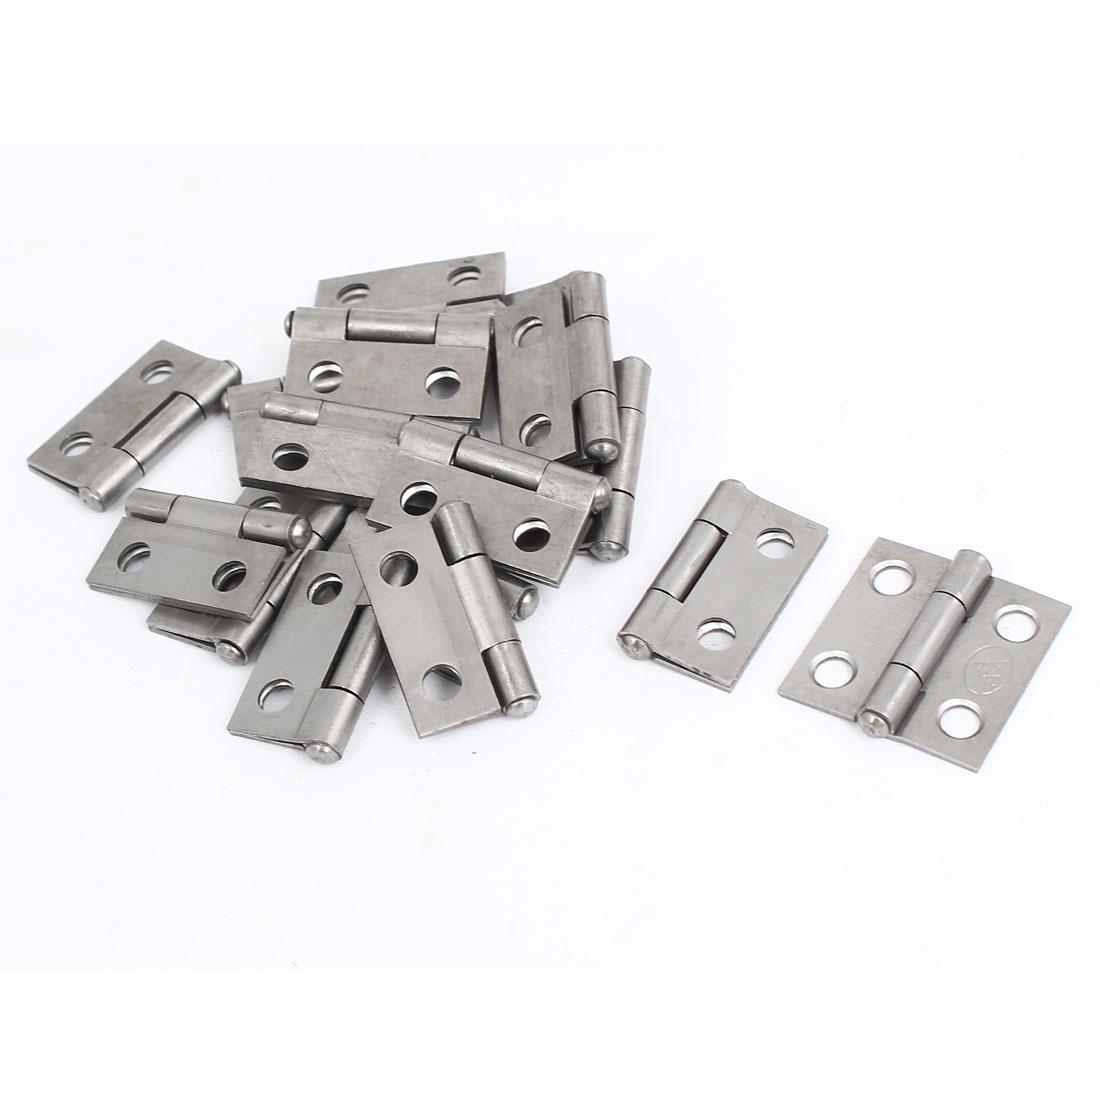 "Cupboard Cabinet Furniture Hardware Folding Door Butt Hinges Silver Gray 1"" Long 16pcs"